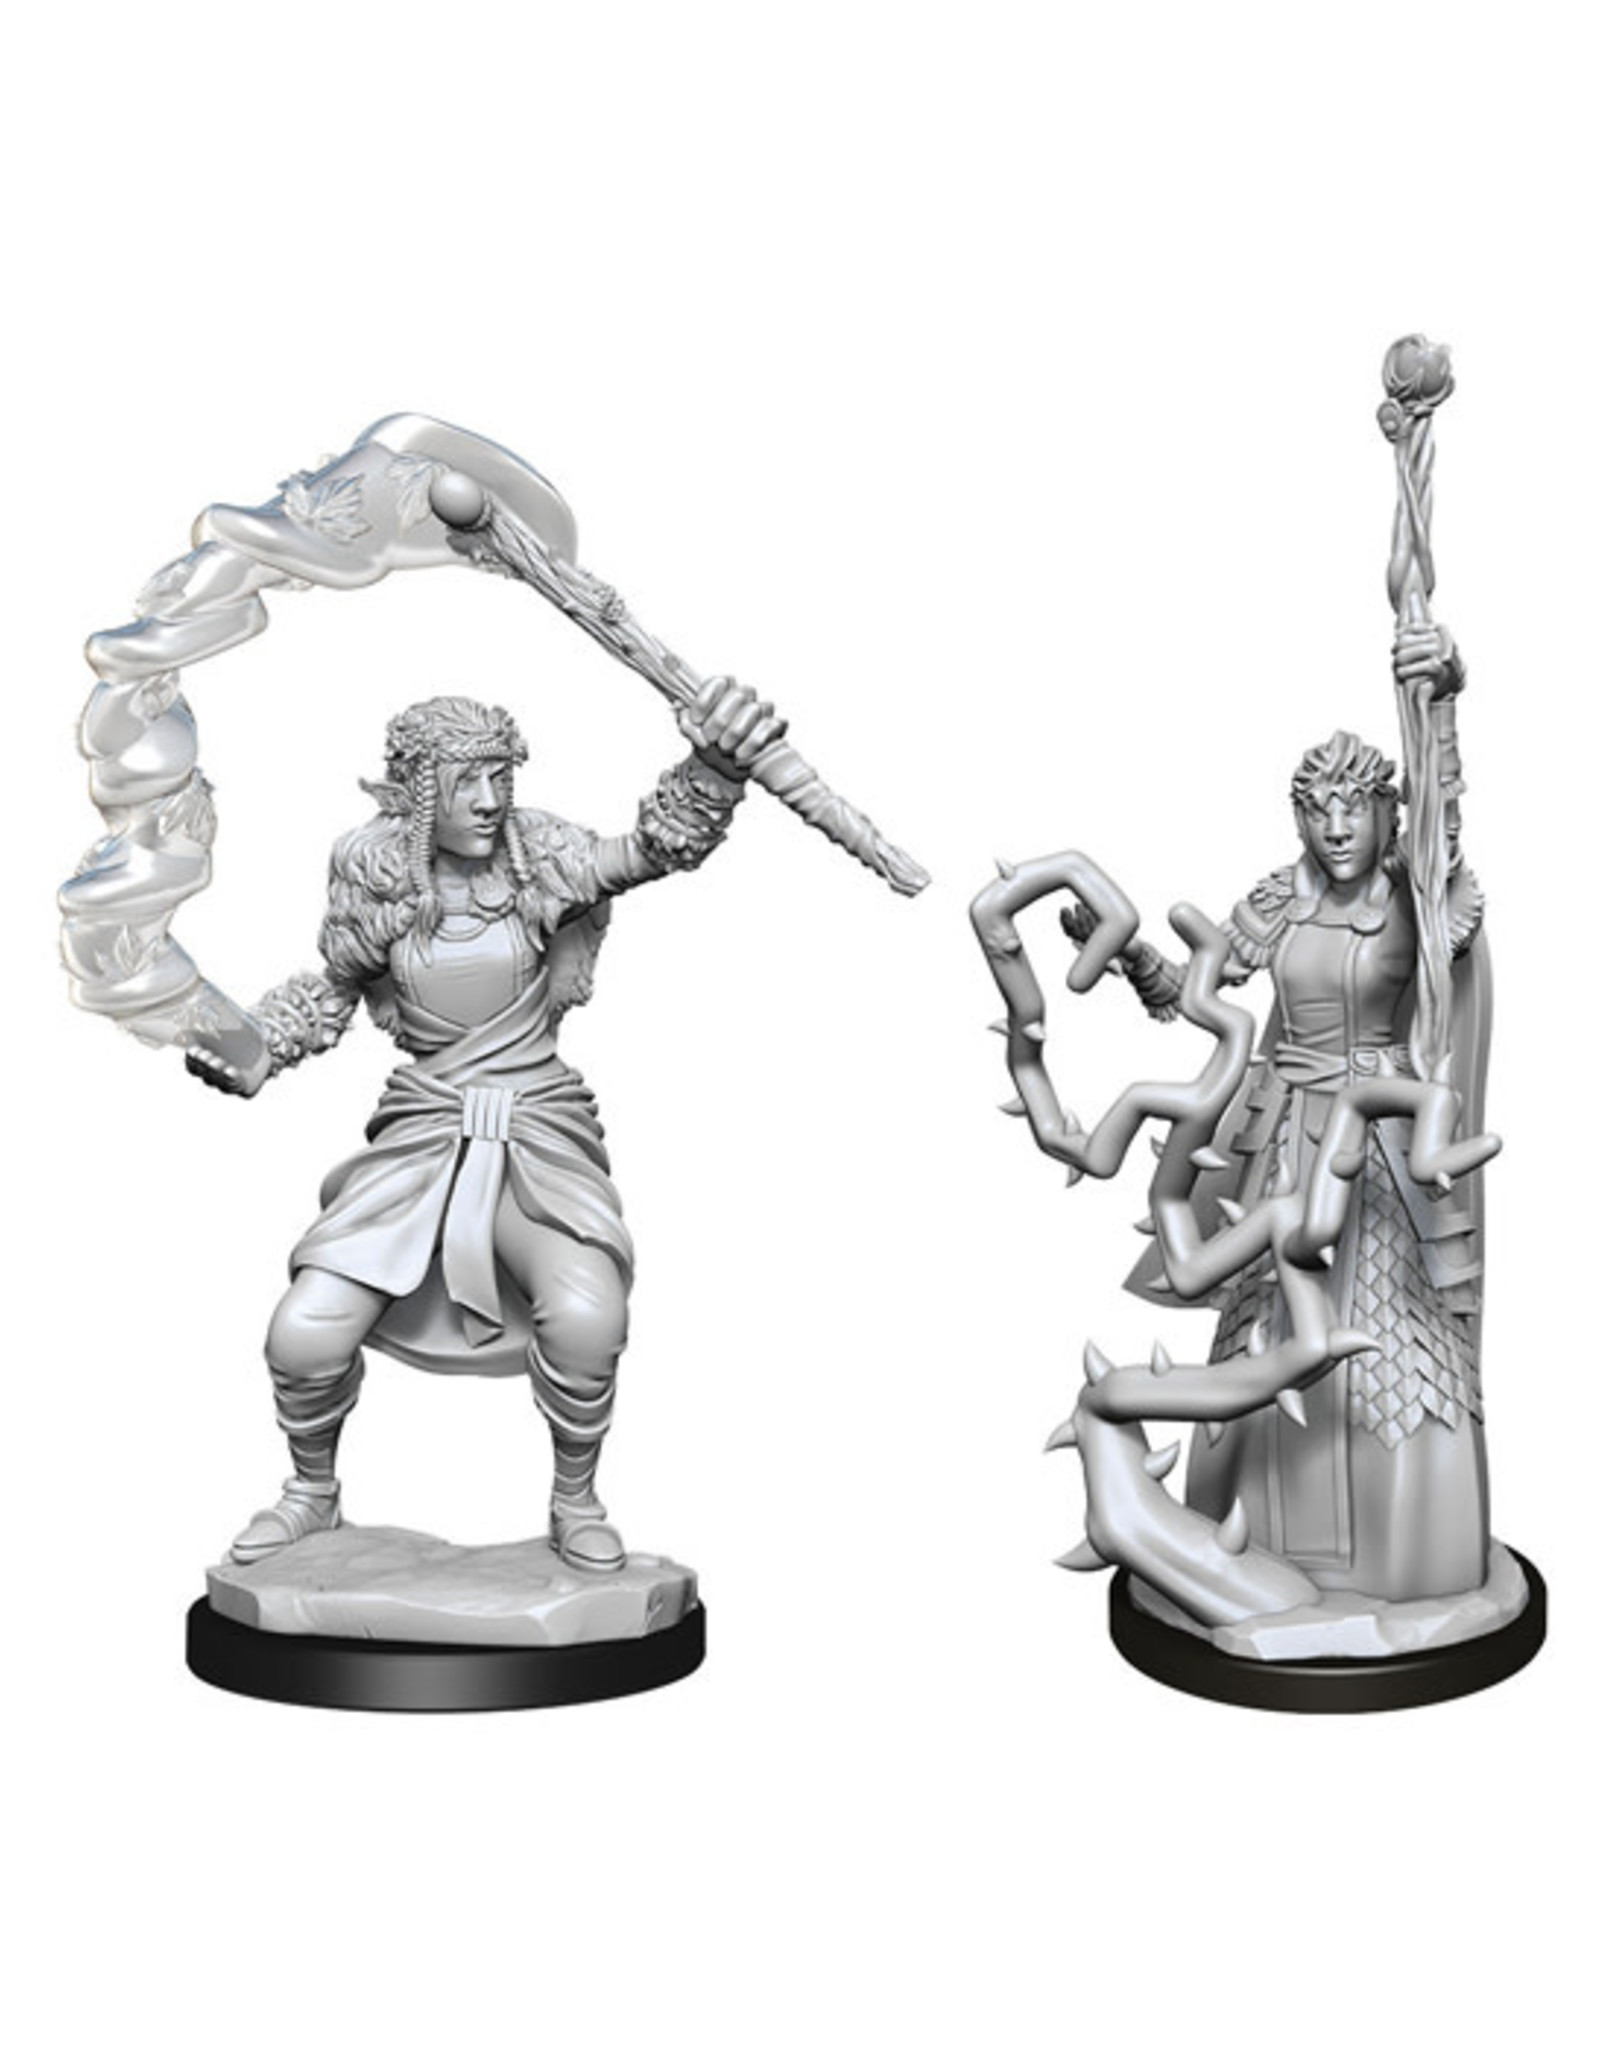 Dungeons & Dragons Dungeons & Dragons: Nolzur's - Firbolg Female Druid